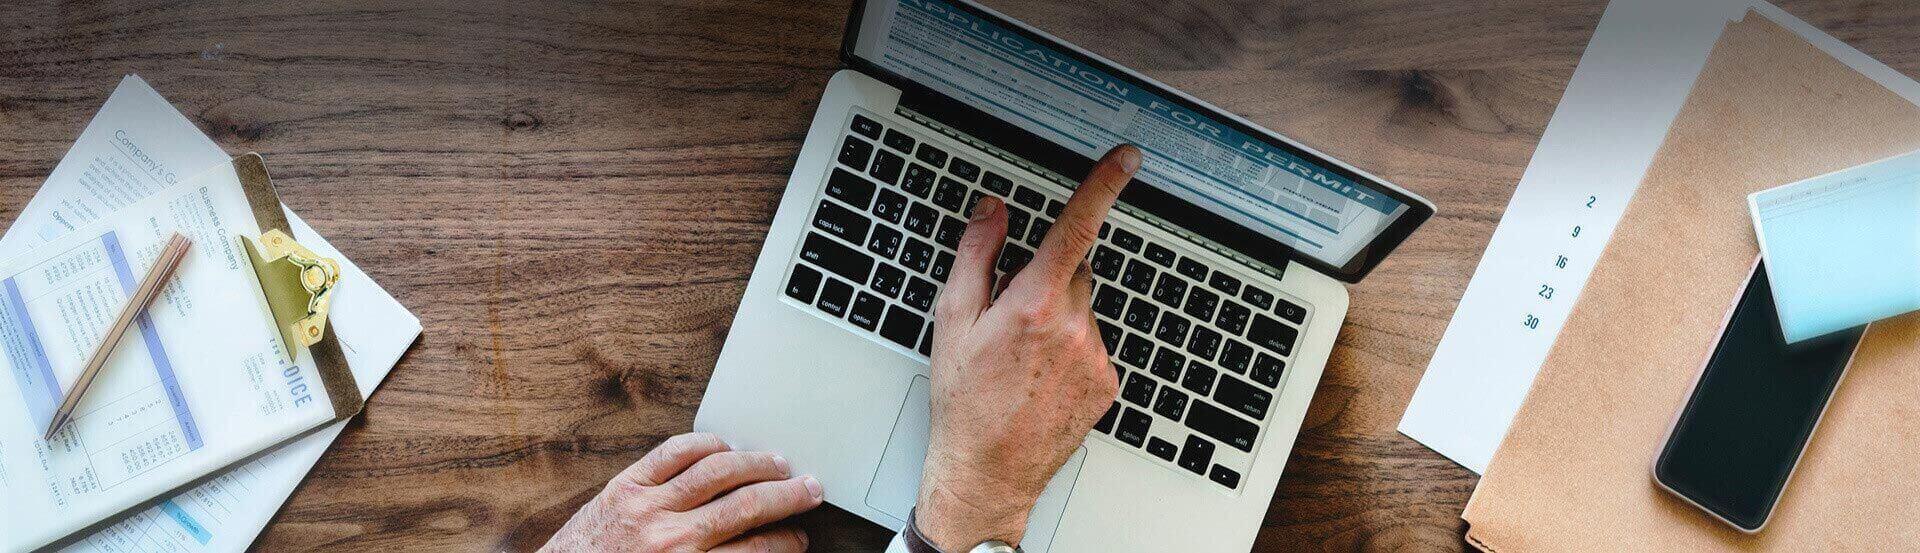 Online marketing survey